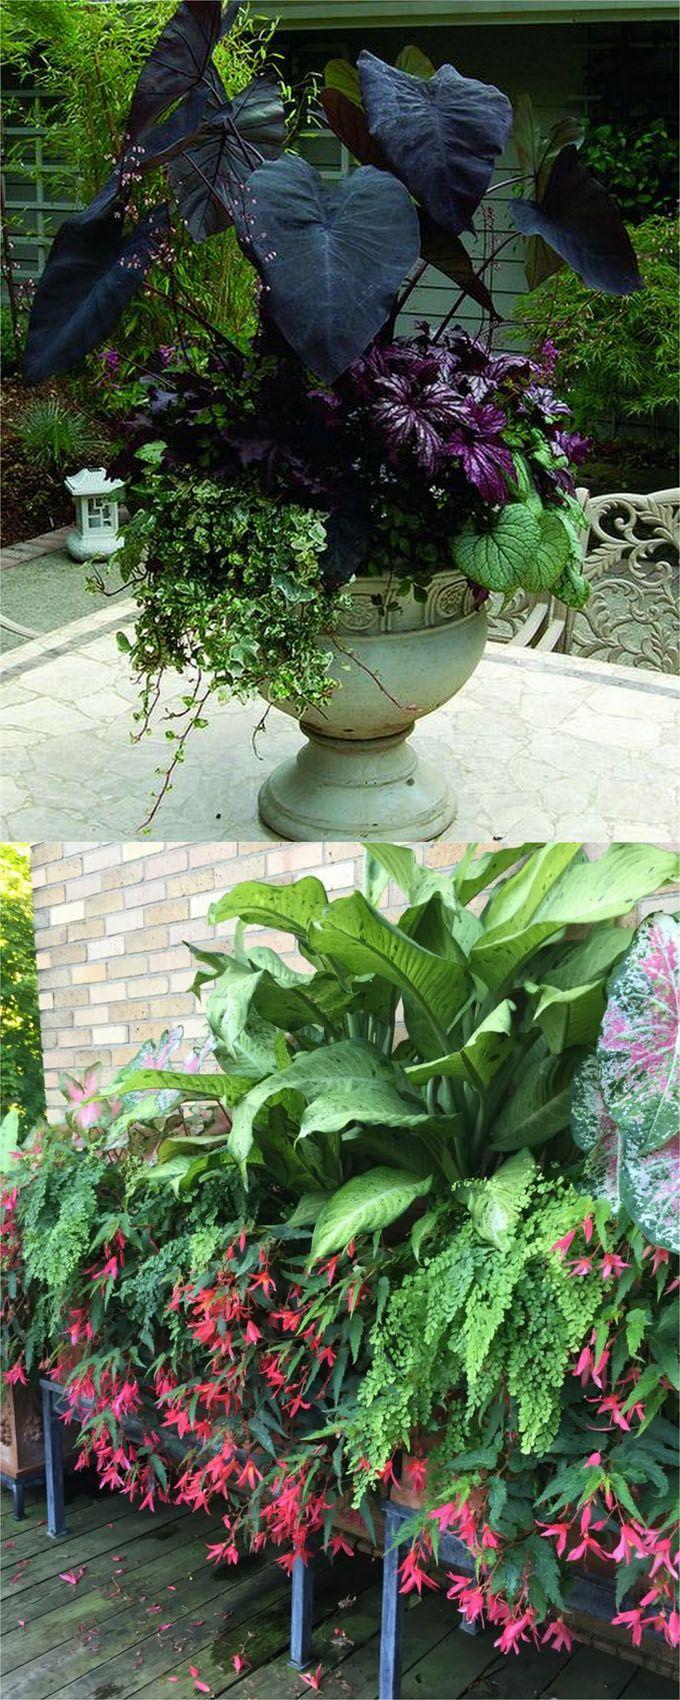 Garden Pots 25 Best Garden Pots Ideas On Pinterest Potted Plants Potted